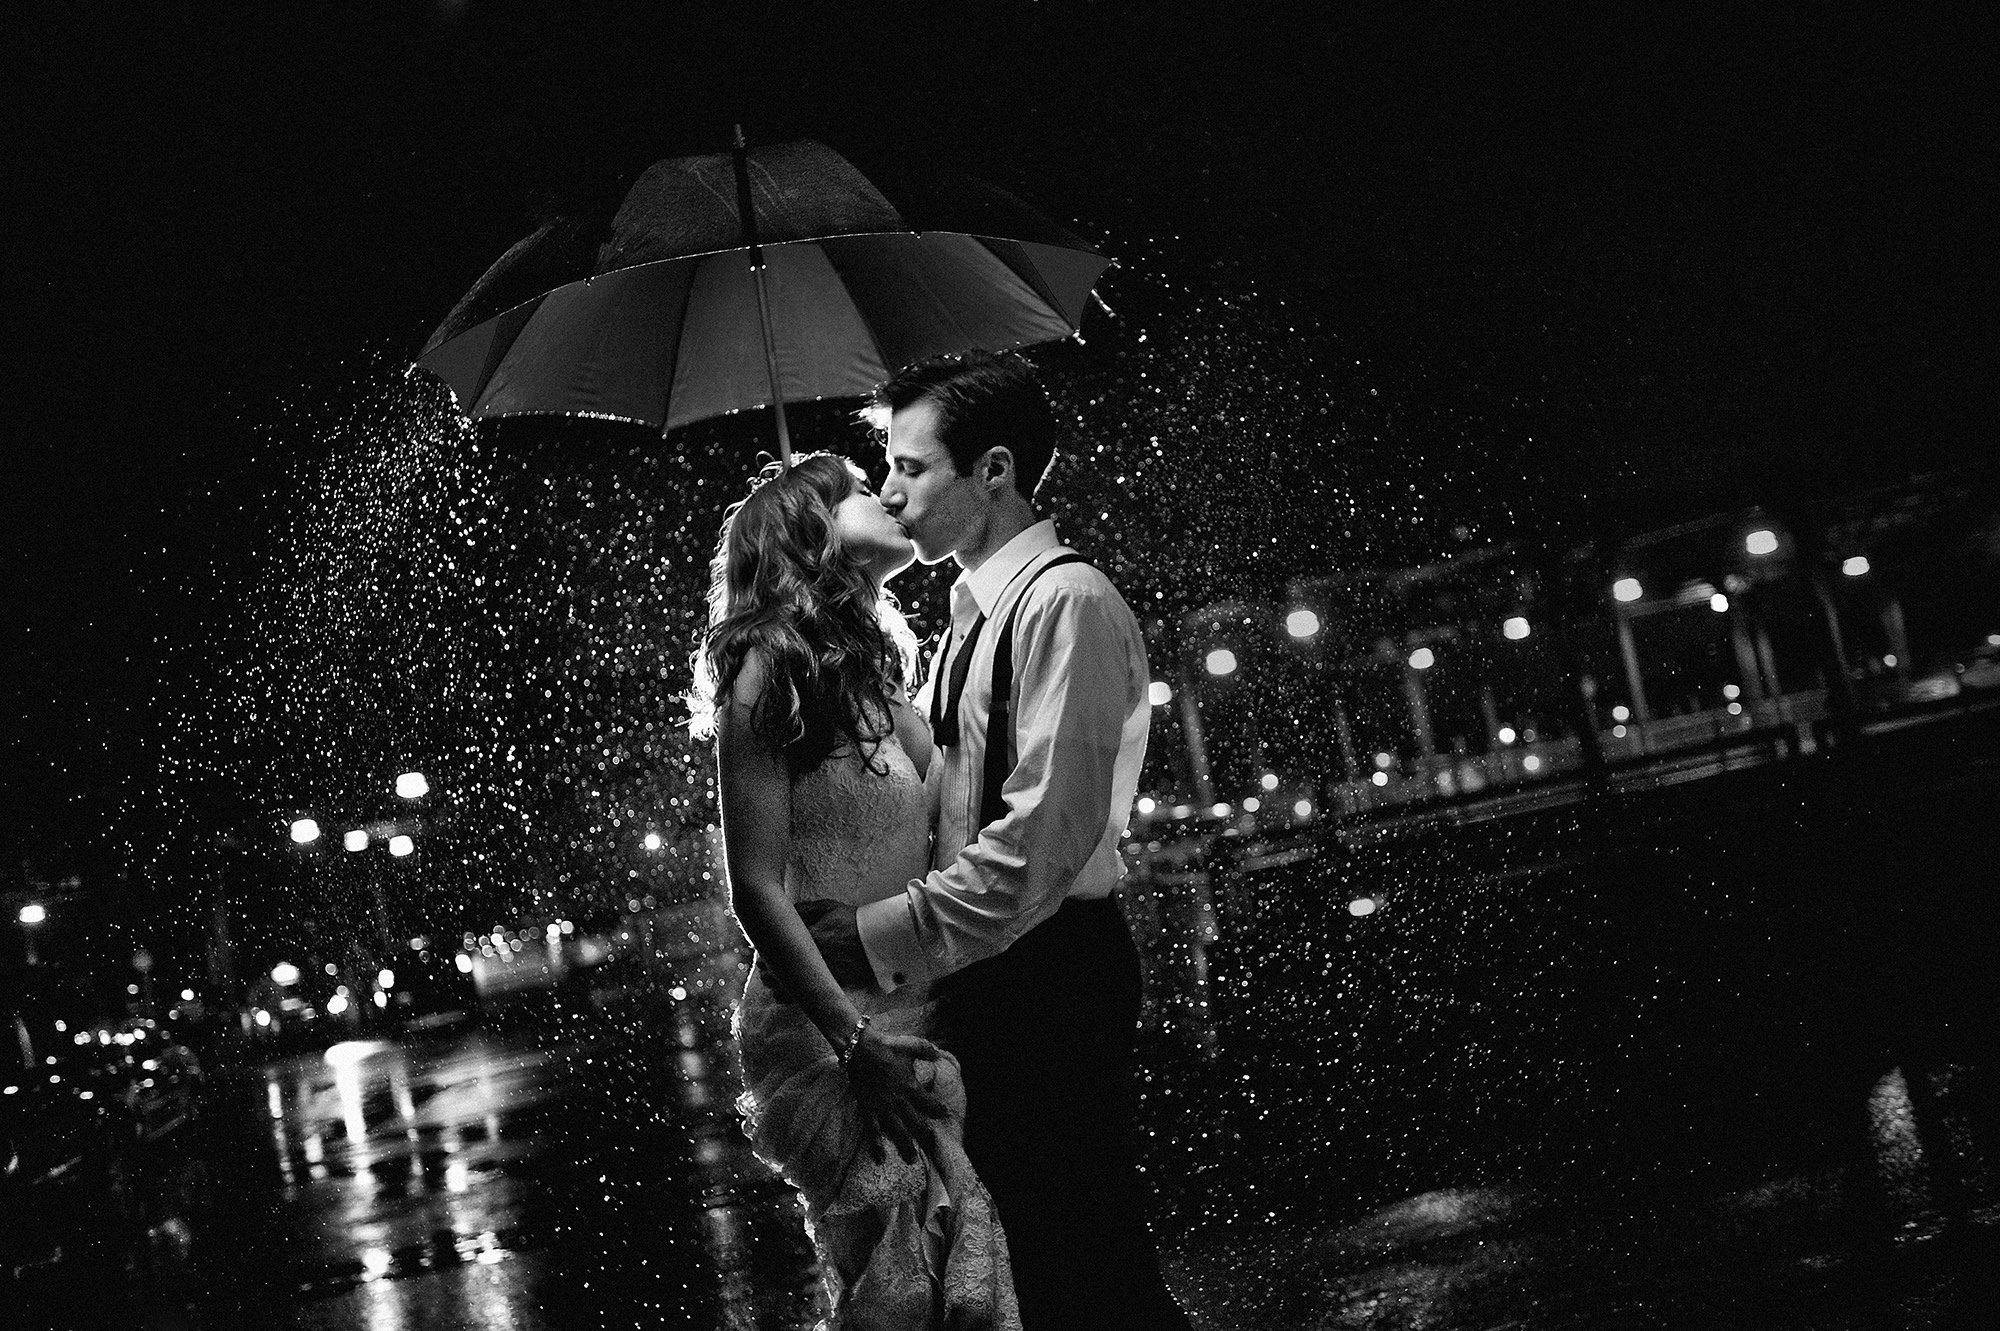 Nighttime couple kiss under umbrella -  Davina + Daniel